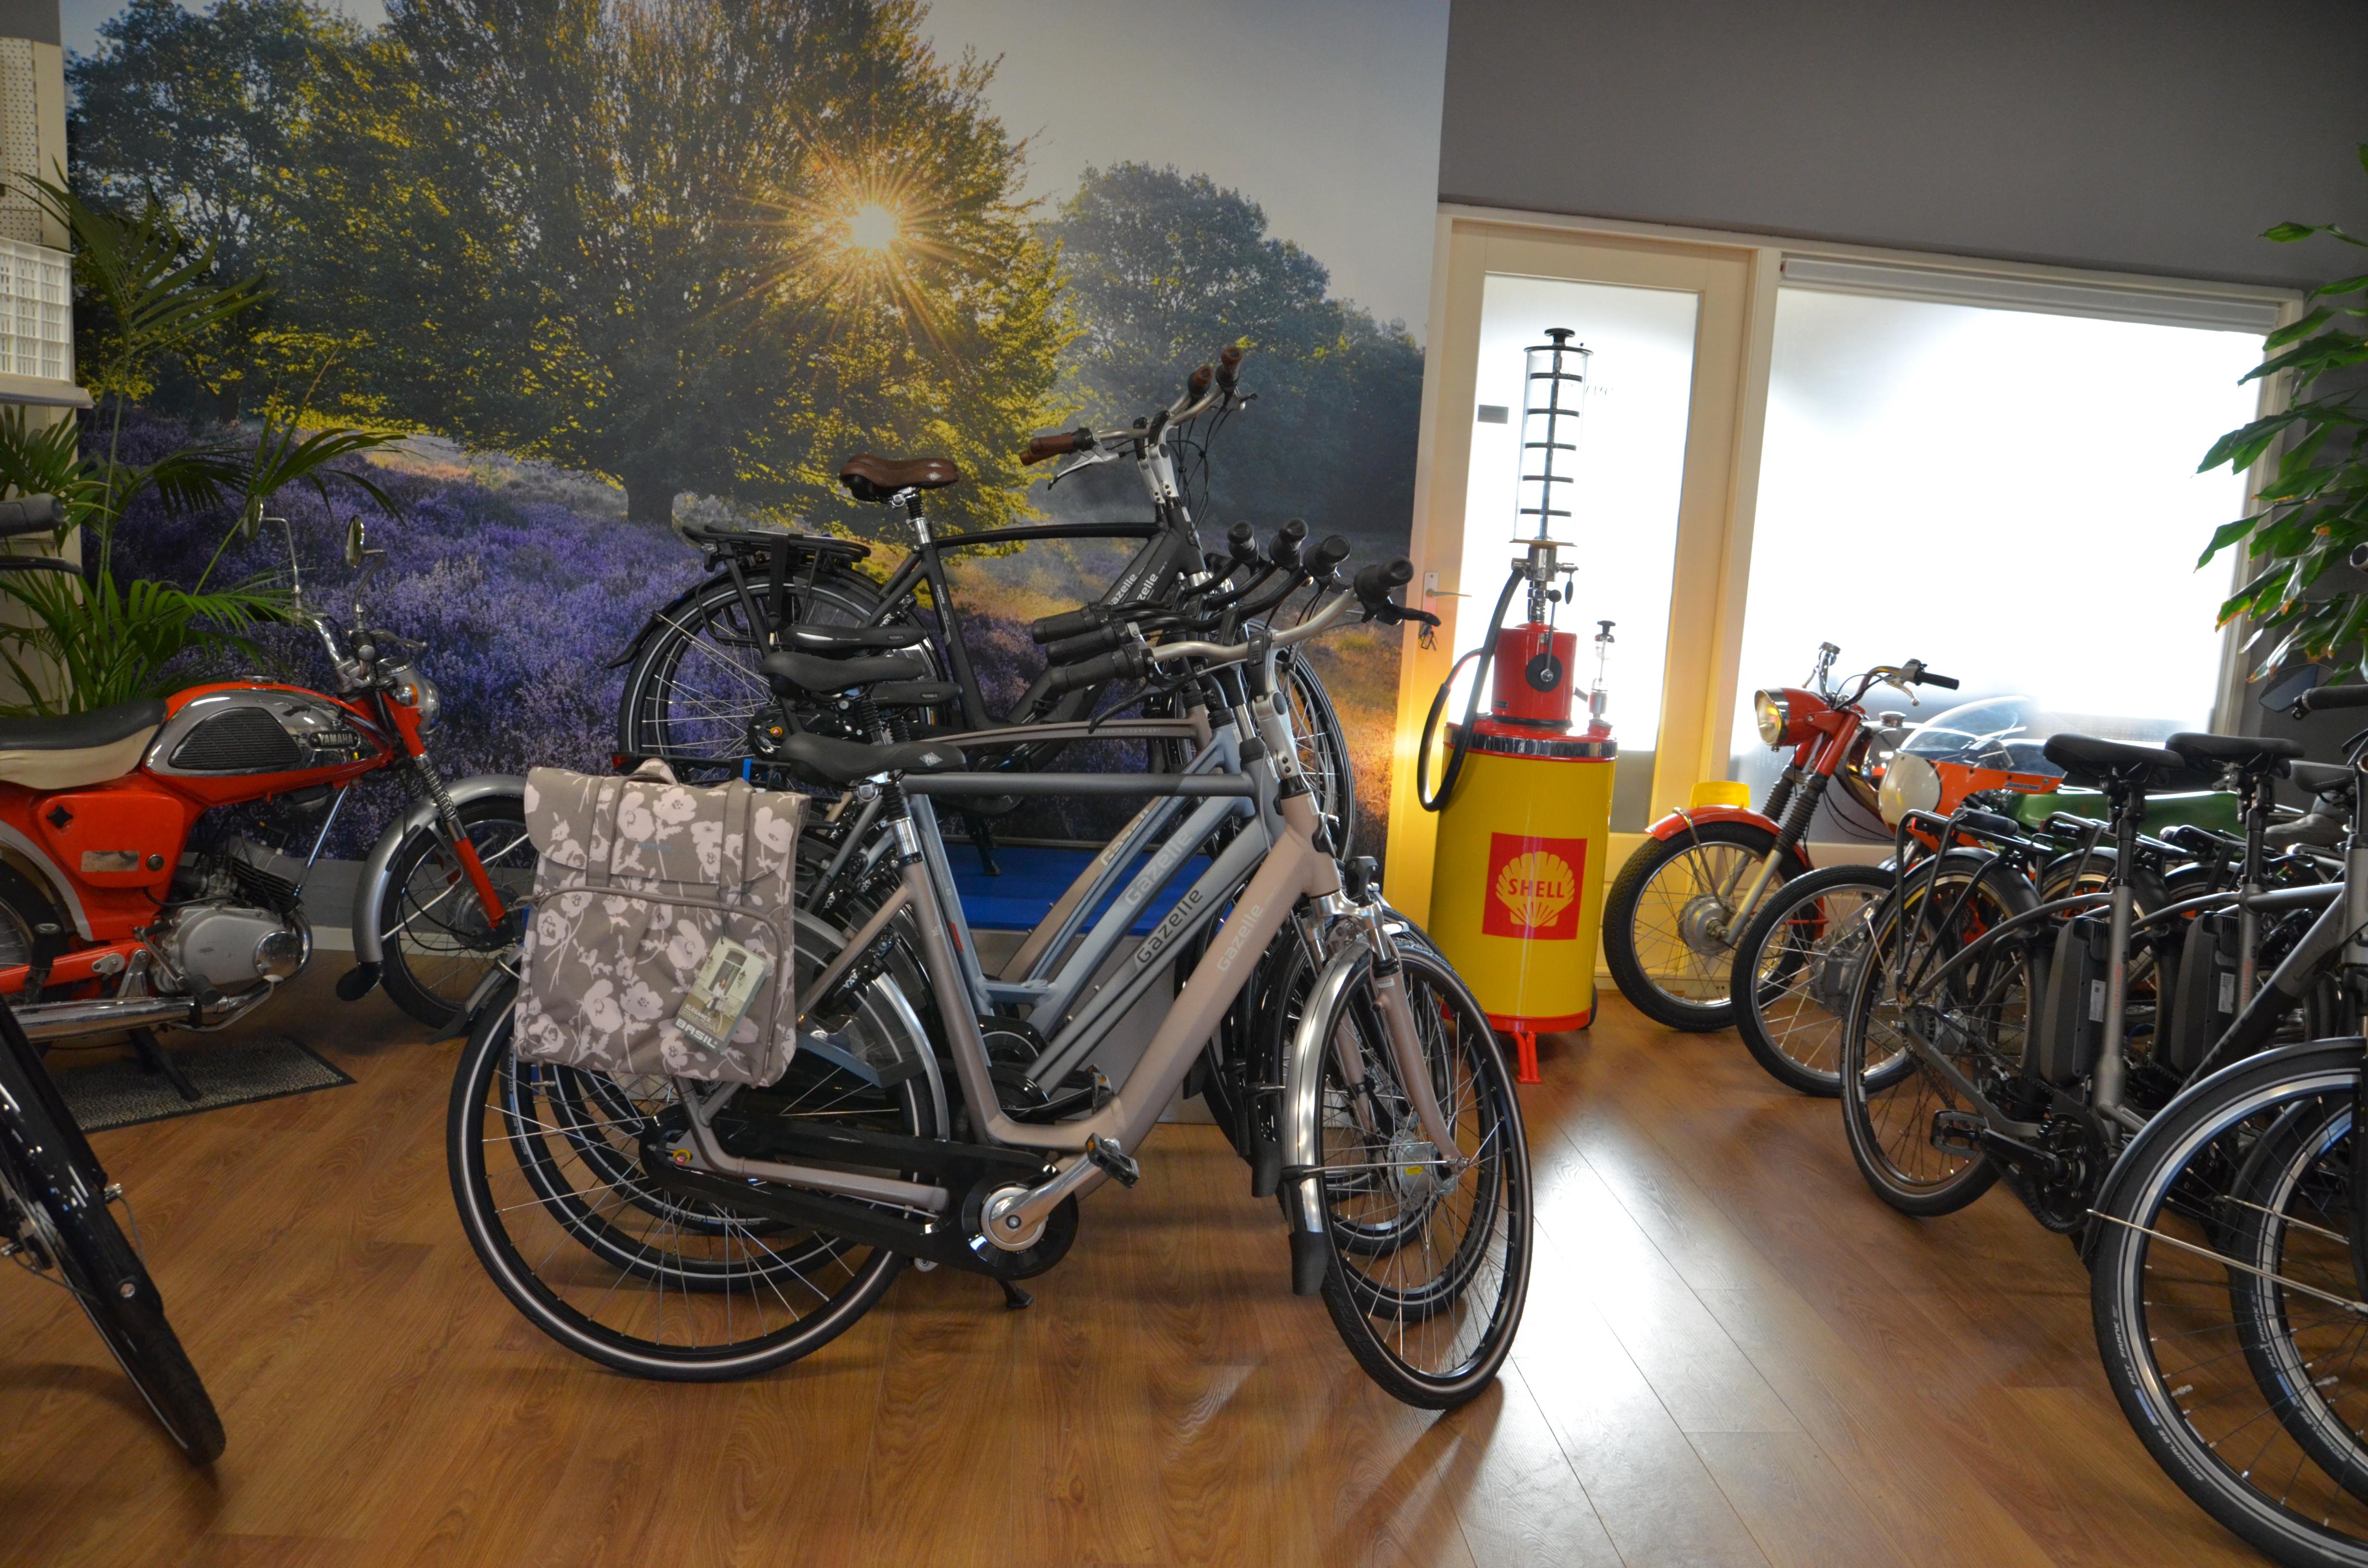 Jeuring werkt met Gazelle, Sparta, Spiked Cycles en Kruitbosch.